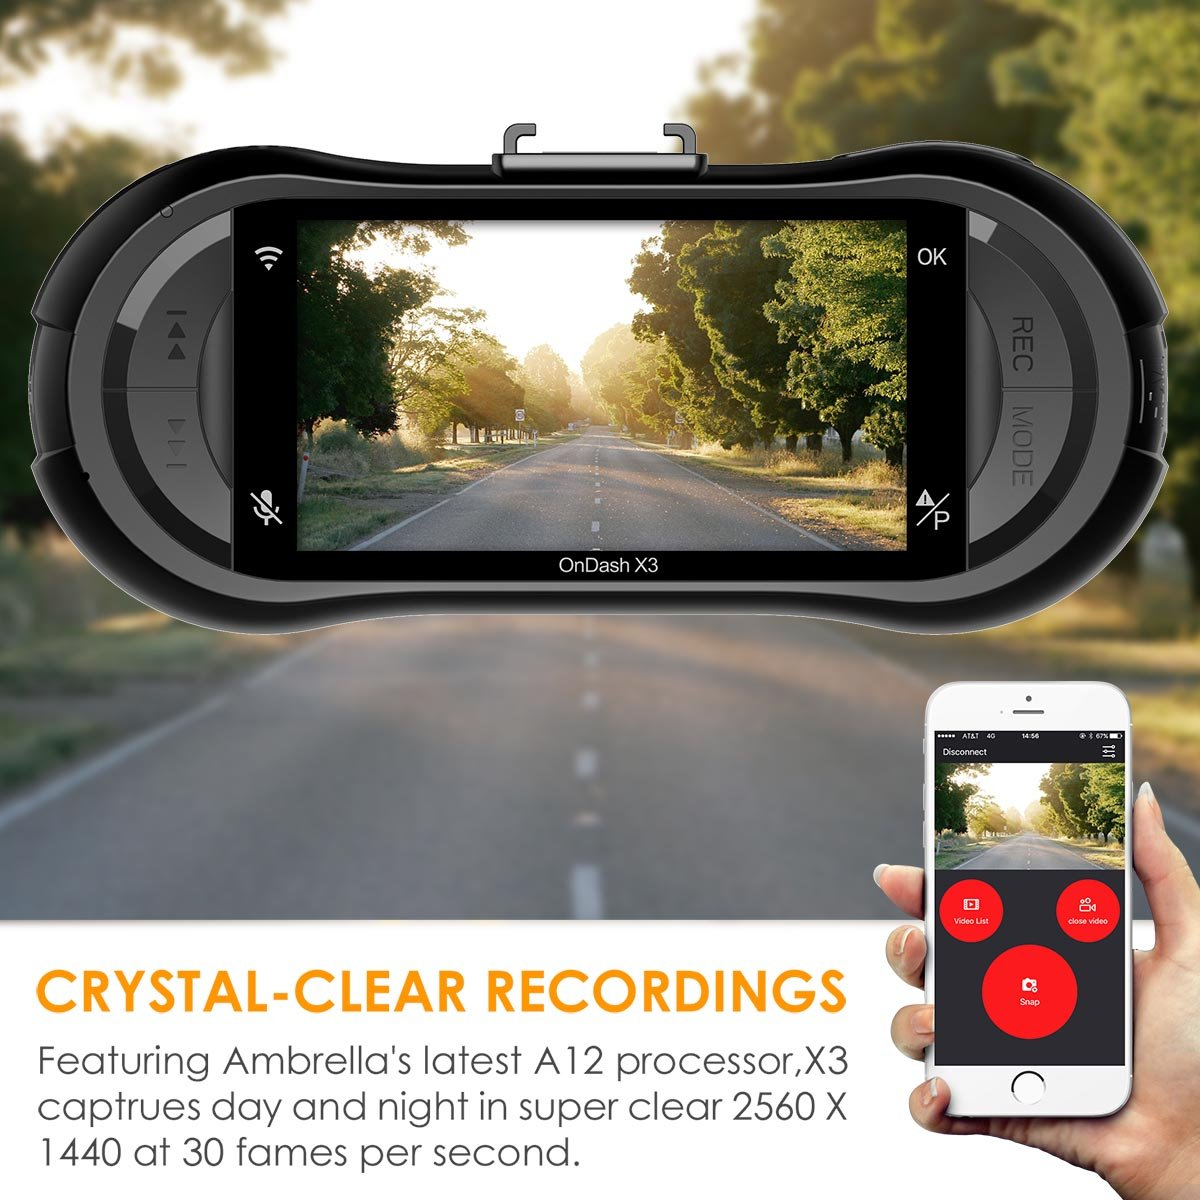 Vantrue X3 WIFI Dash Cam, Super HD 2.5K Car Dashboard Camera 1440P Car Camera with Ambarella A12 Chipset, 170°Wide Angle, Super HDR Night Vision, Loop Recording, Parking Mode, Motion Detection by VANTRUE (Image #2)